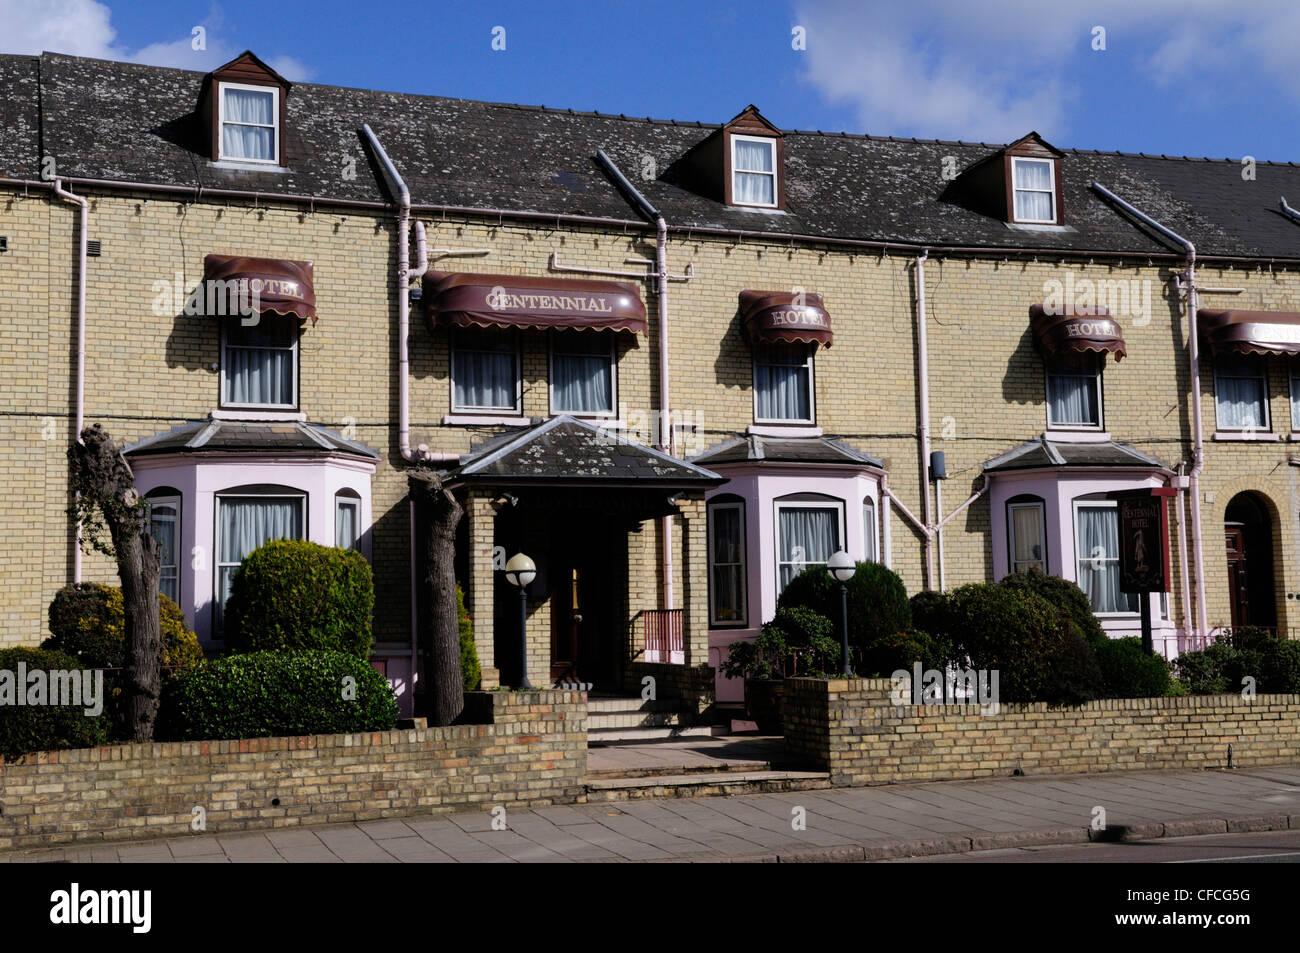 The Centennial Hotel, Hills Road, Cambridge, England, UK - Stock Image